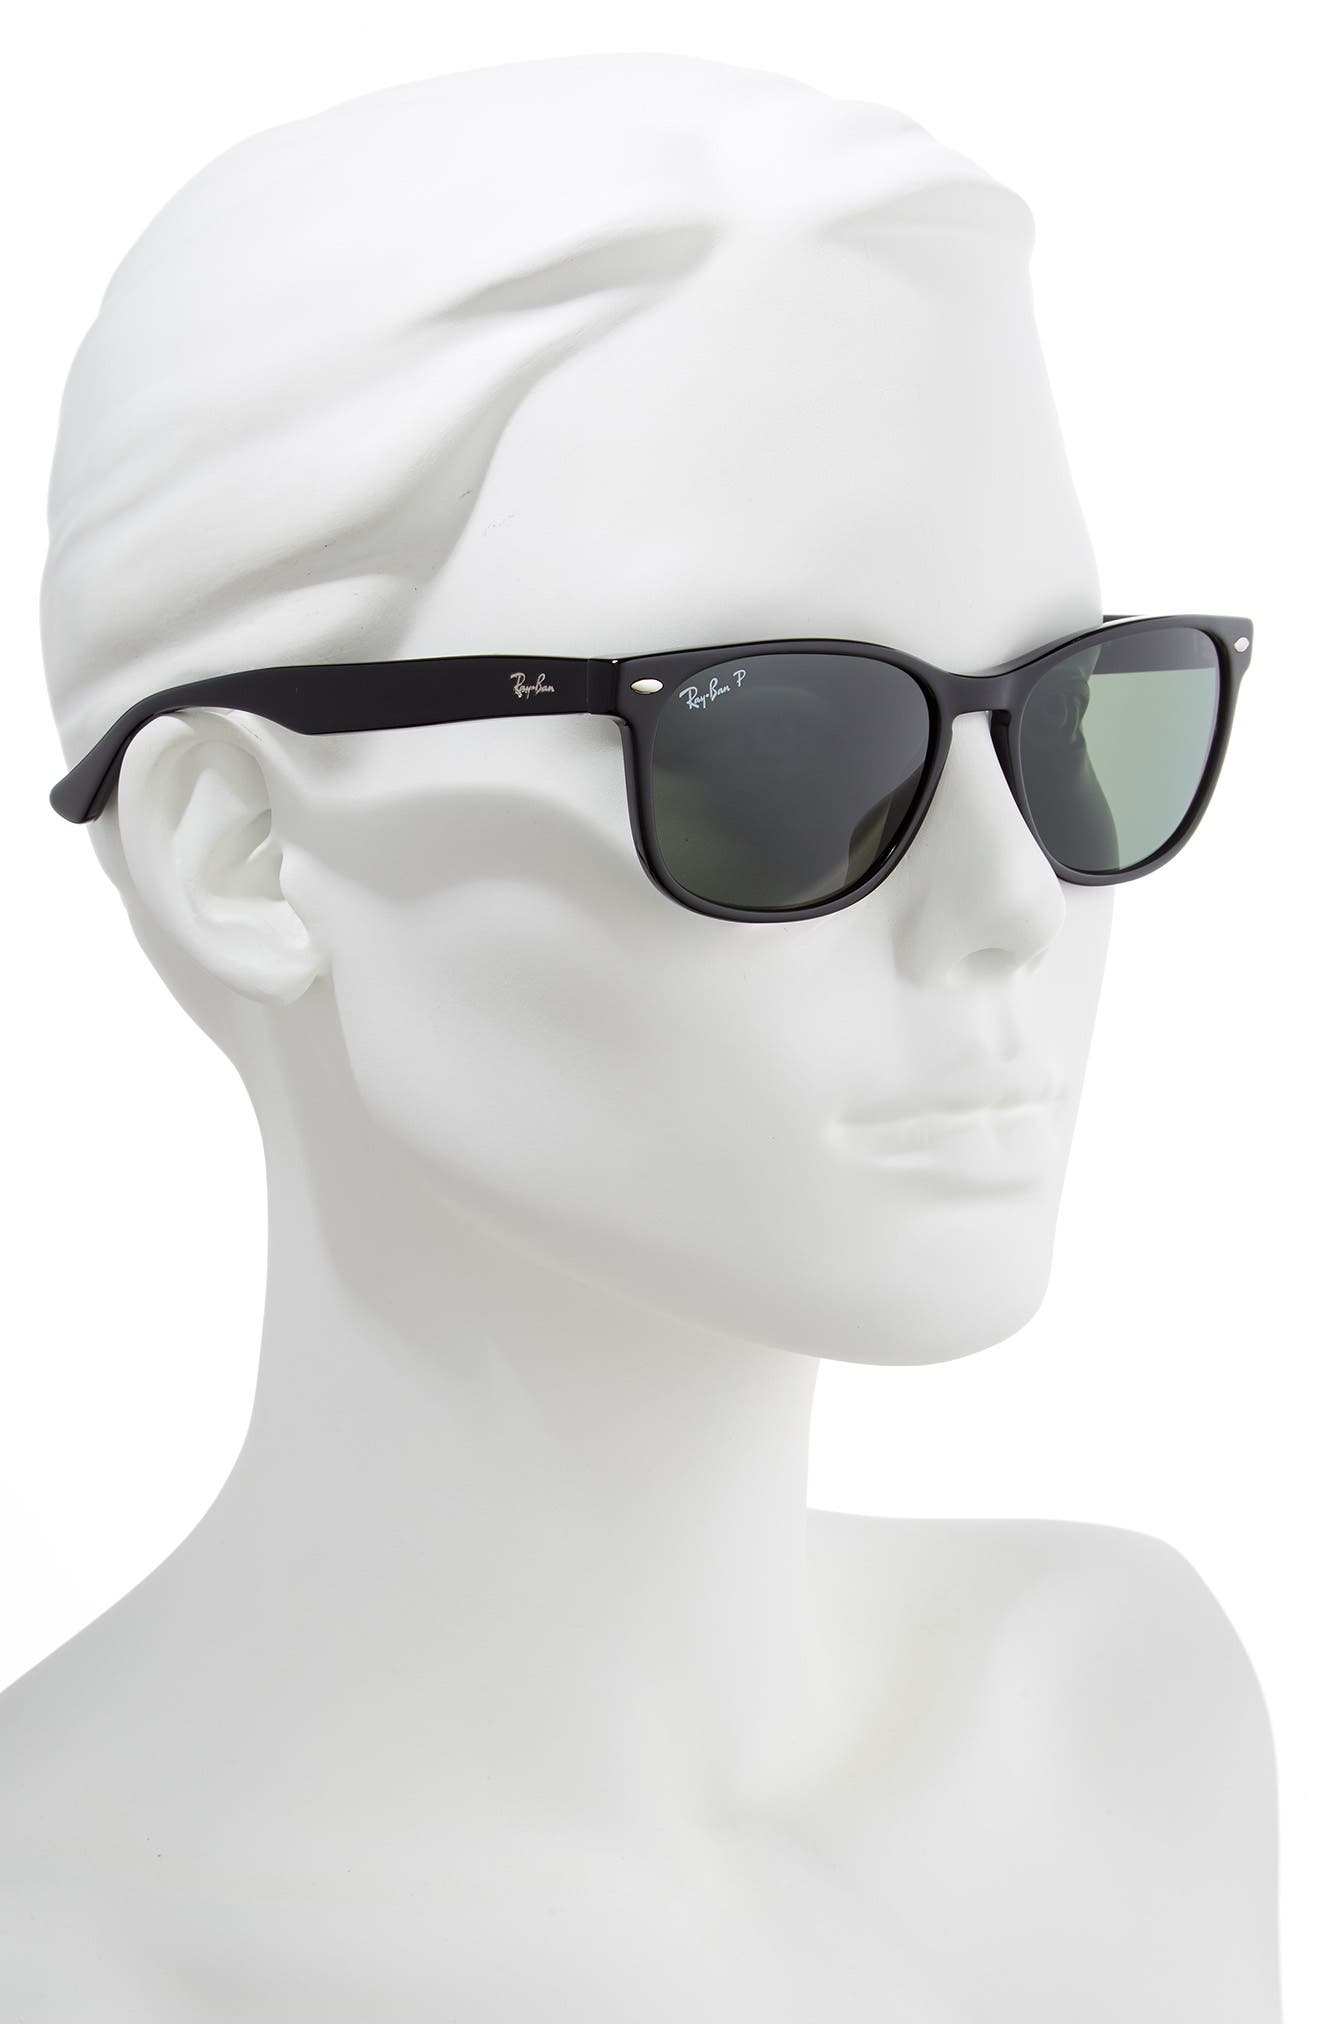 57mm Wayfarer Polarized Sunglasses,                             Alternate thumbnail 2, color,                             BLACK/ GREEN SOLID